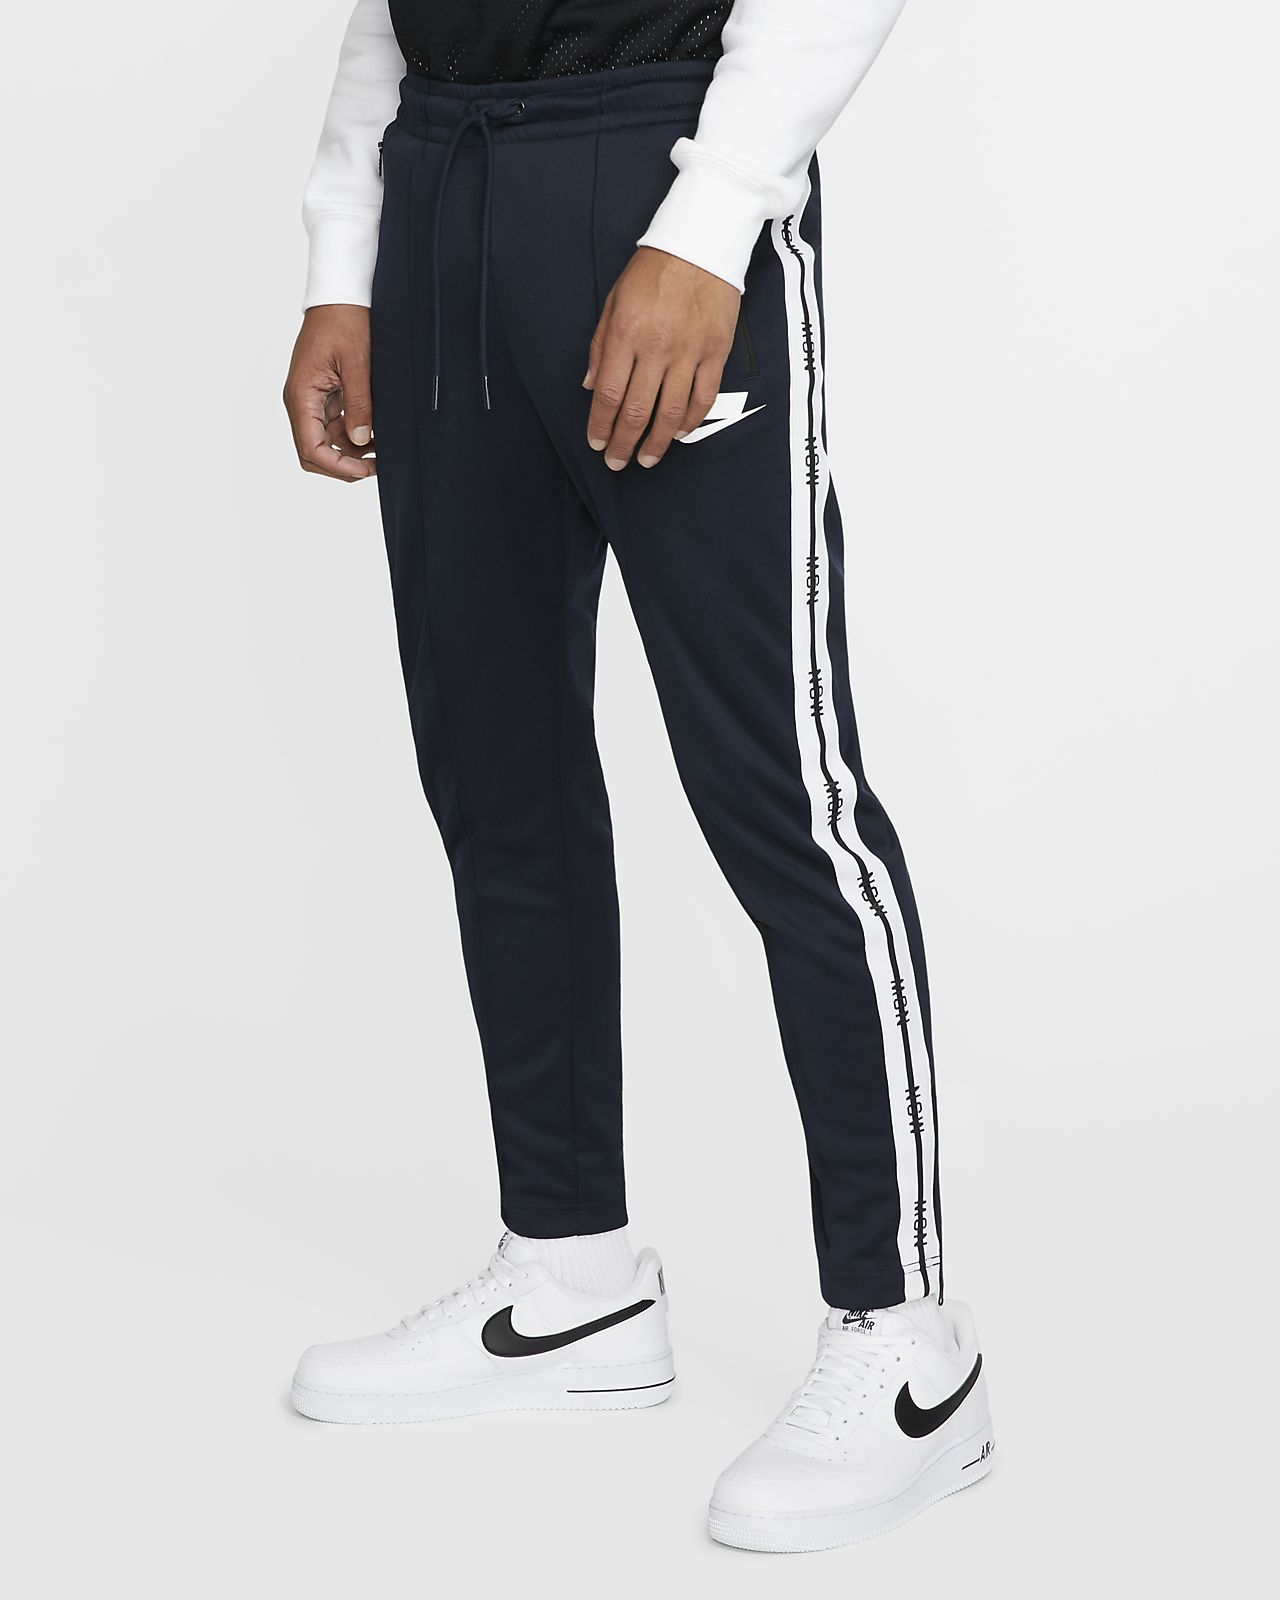 skate shoes online store official shop Pantalon de survêtement Nike Sportswear NSW